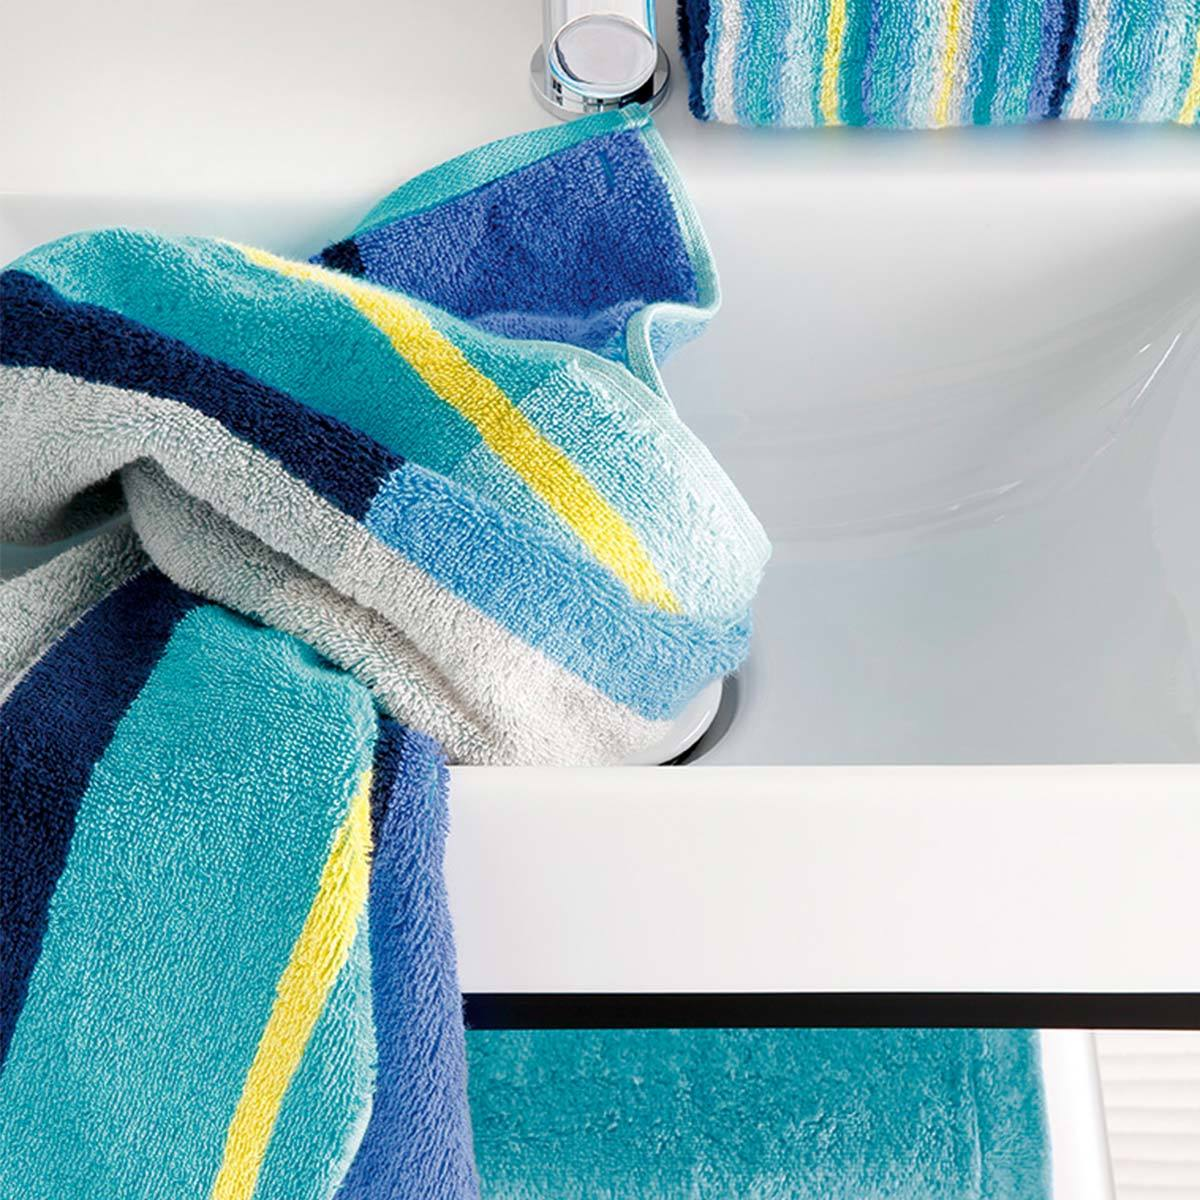 caw handt cher paint karo g nstig online kaufen bei bettwaren shop. Black Bedroom Furniture Sets. Home Design Ideas